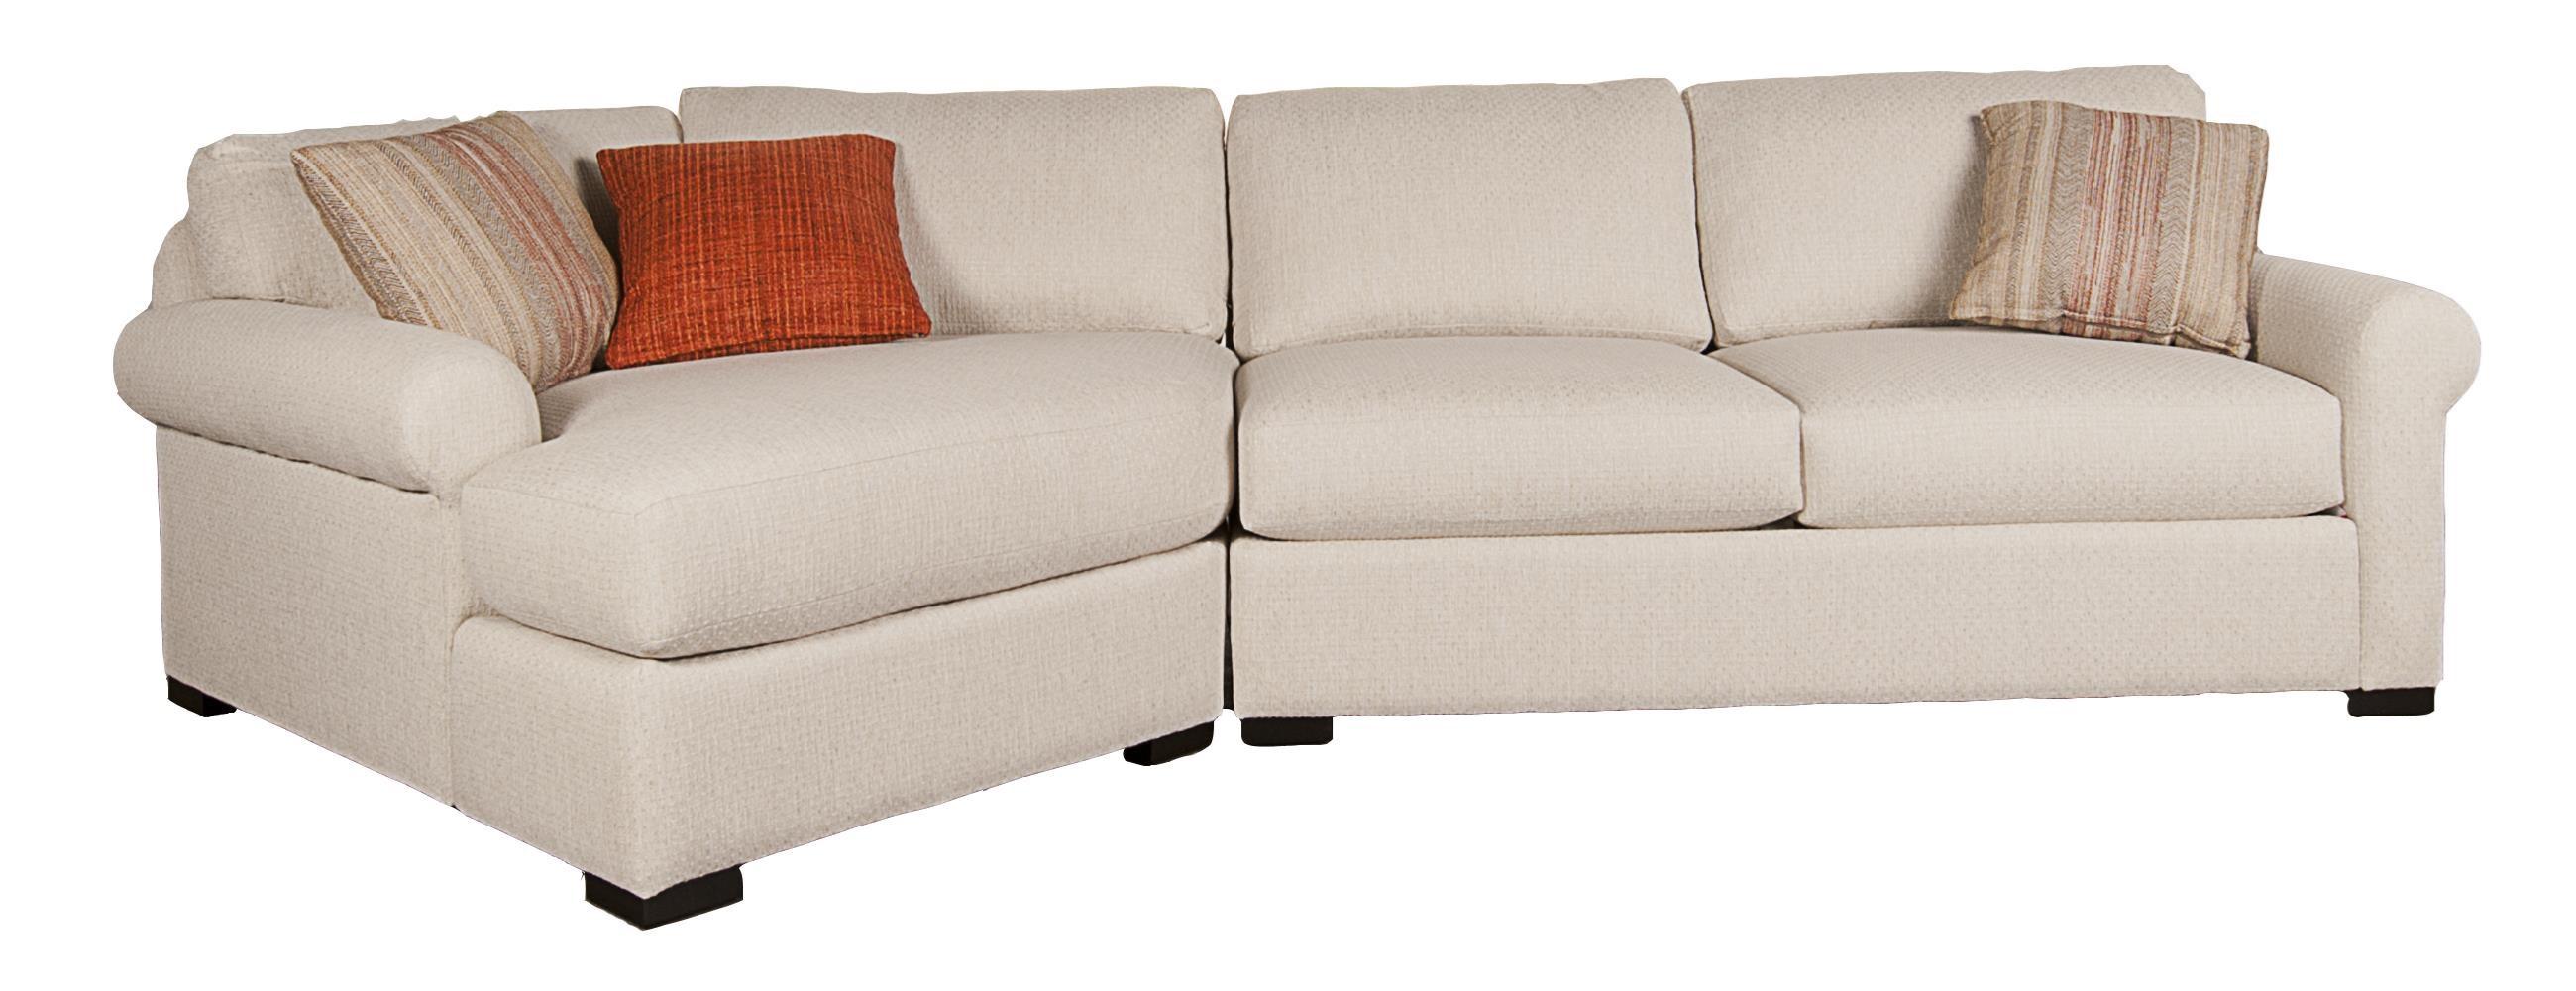 Morris Home Furnishings Herah Herah 2-Piece Sectional - Item Number: 117829206